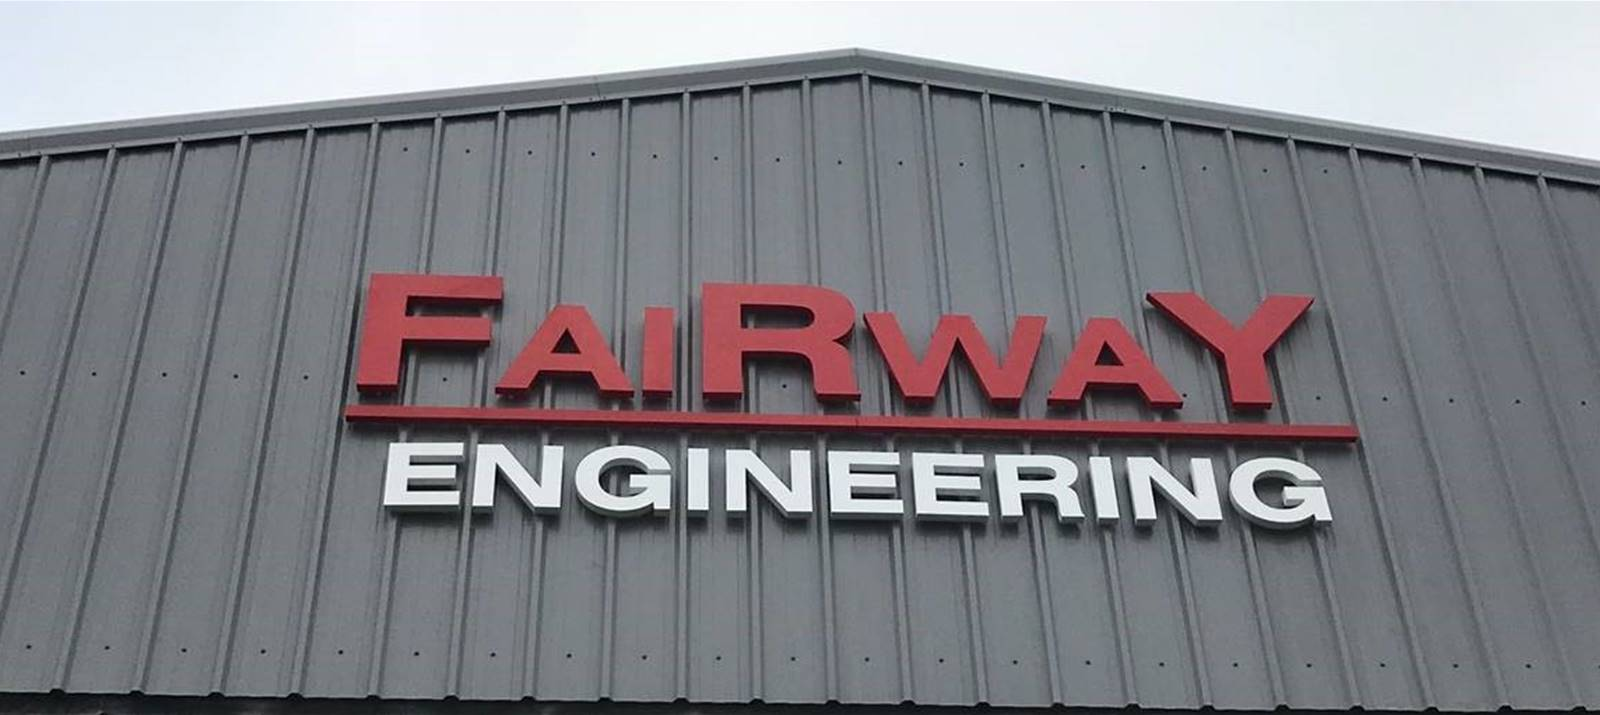 Fairway Engineering Built-up Lettering